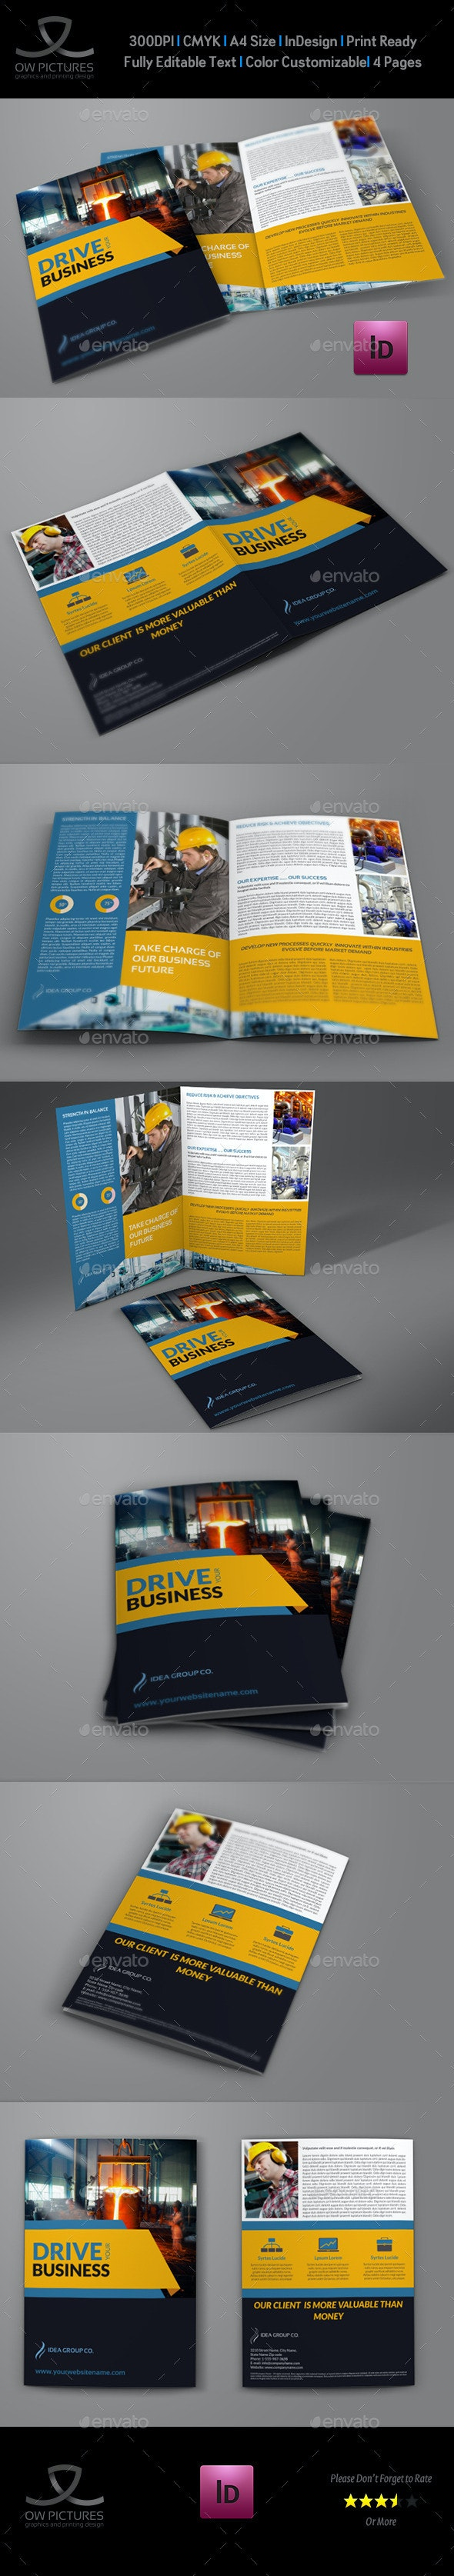 Industrial Company Brochure Bi-Fold Template Vol2 - Brochures Print Templates